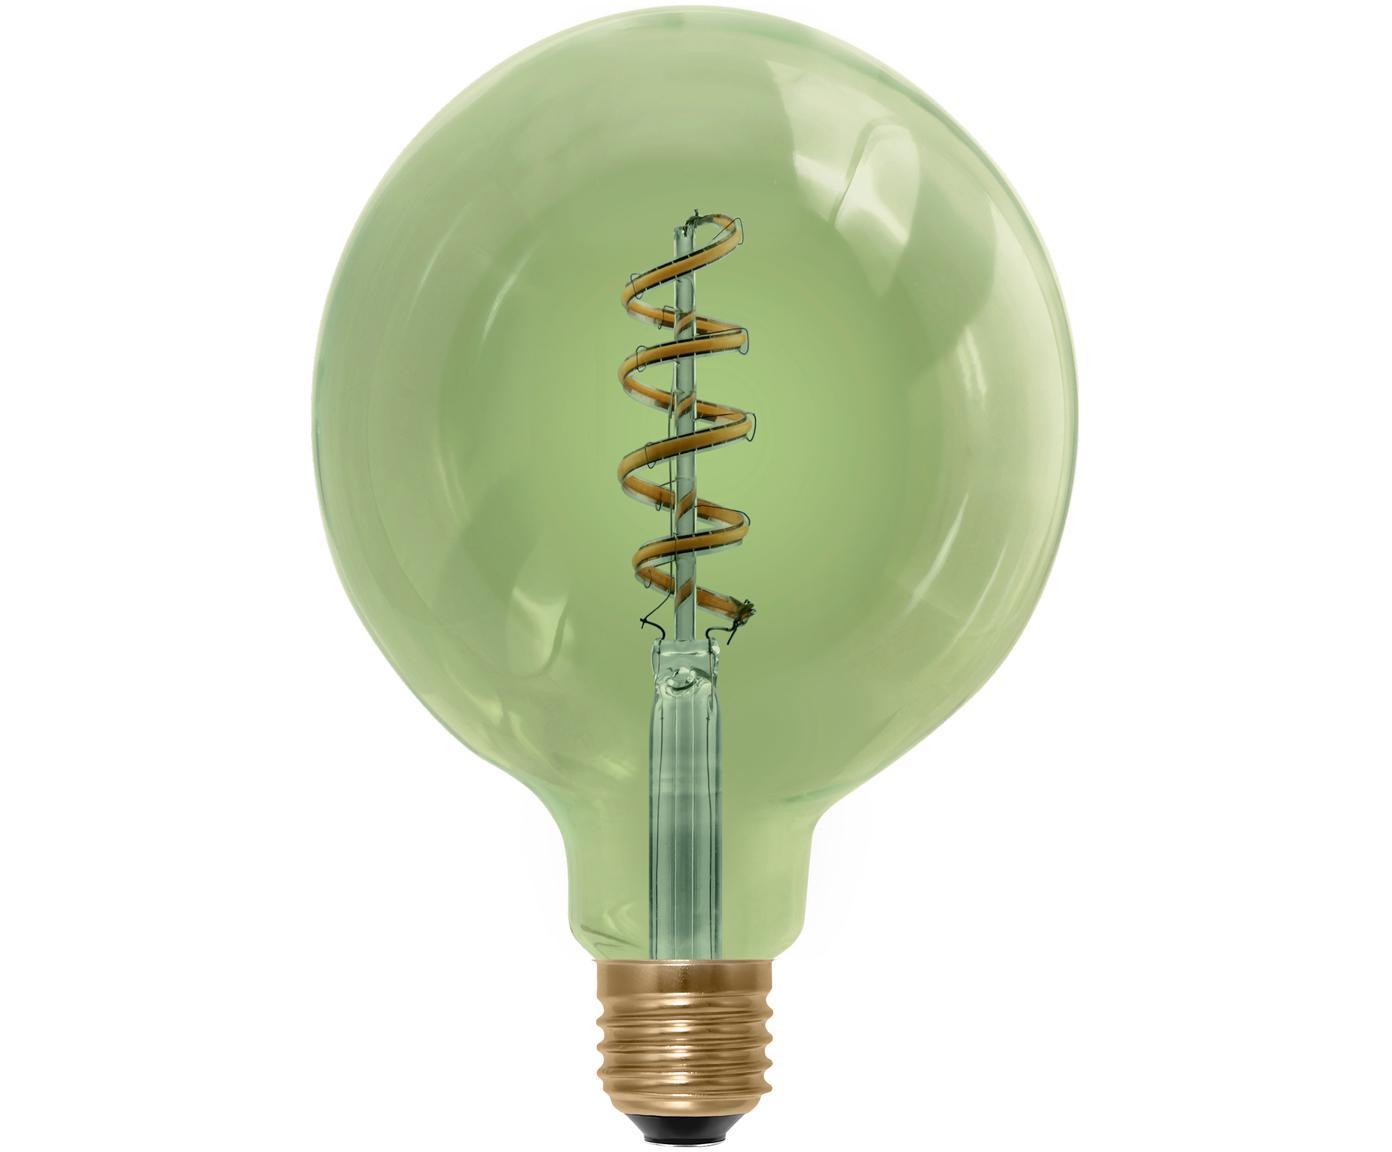 Lampadina a LED Curved (E27 / 8 Watt), Vetro, alluminio, Verde, Ø 13 x Alt. 18 cm